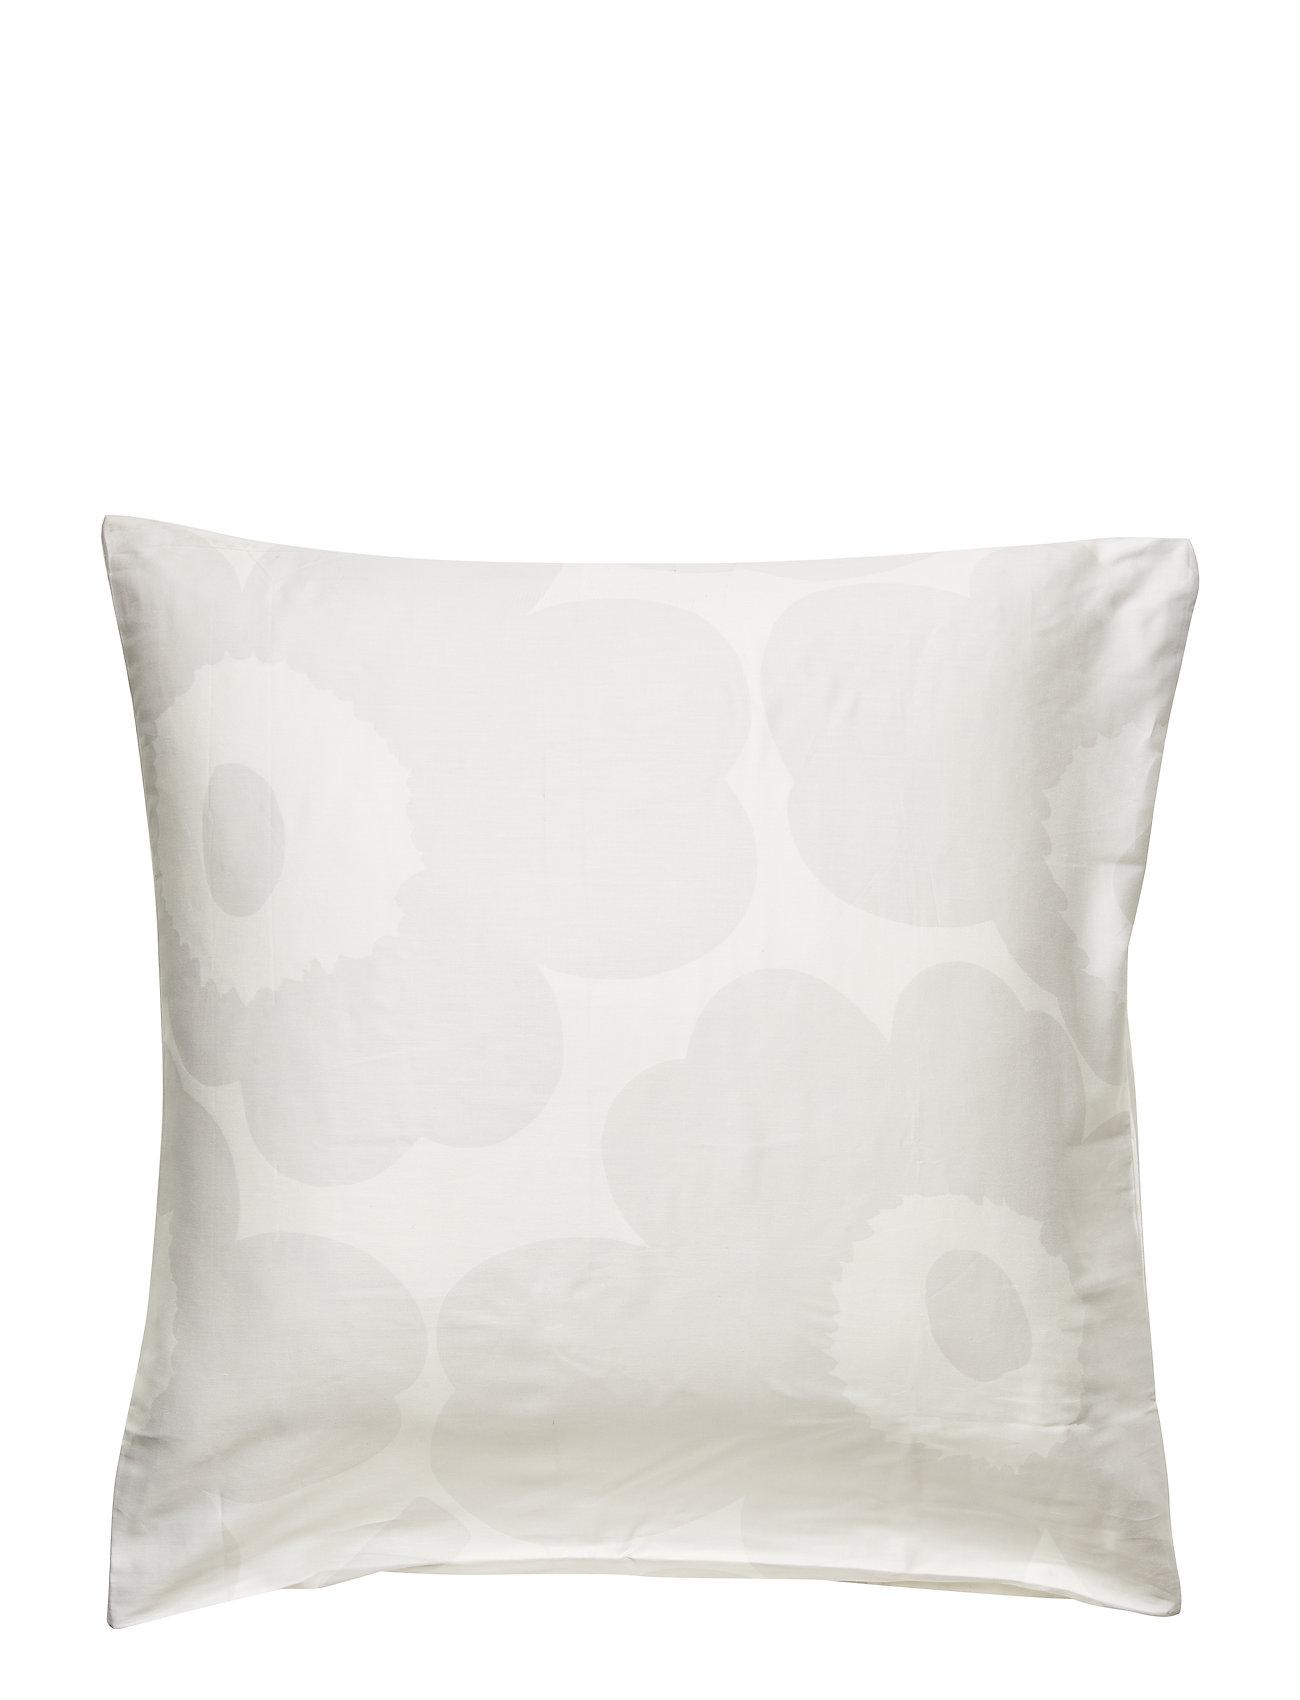 Marimekko Home Unikko Satin pillow case - WHITE, LIGHT GREY